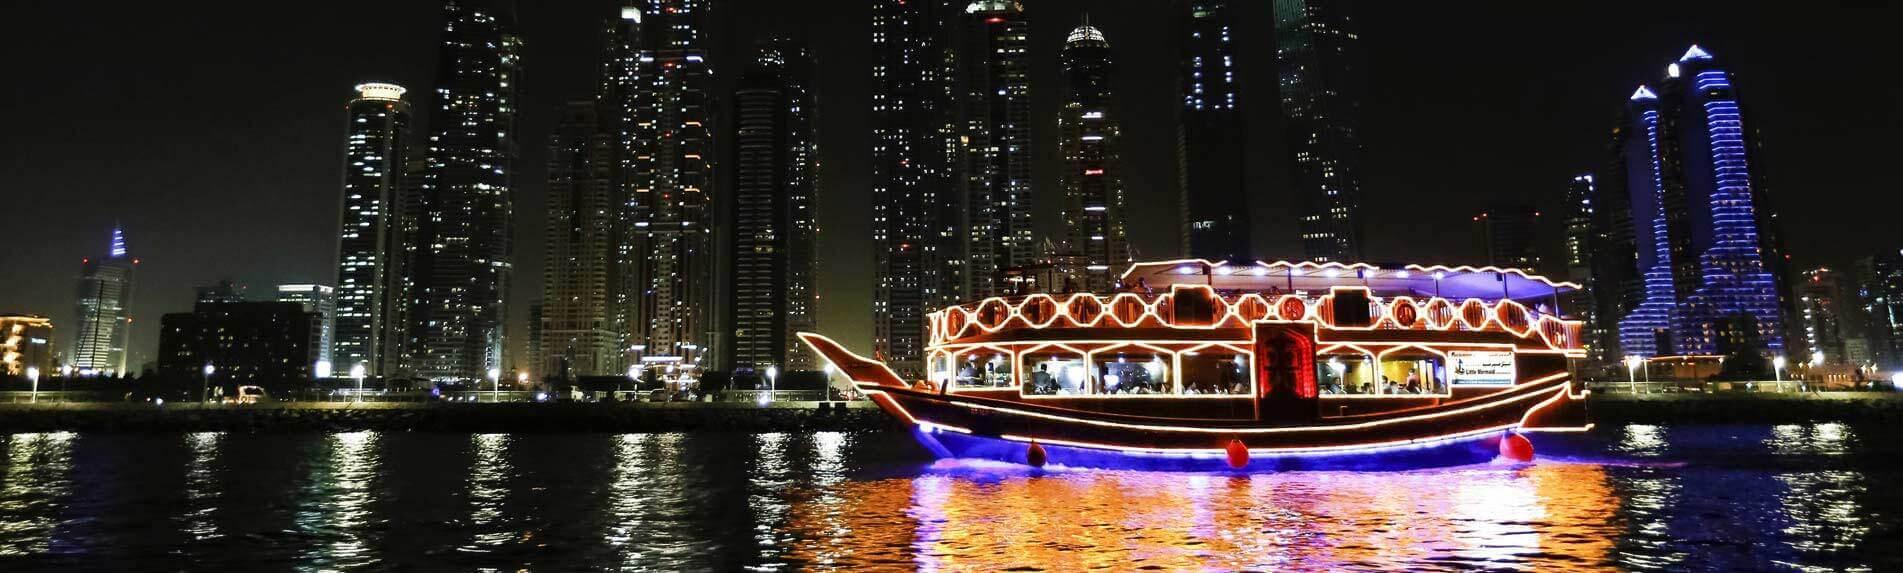 Dhow Cruise Dinner In Dubai Marina